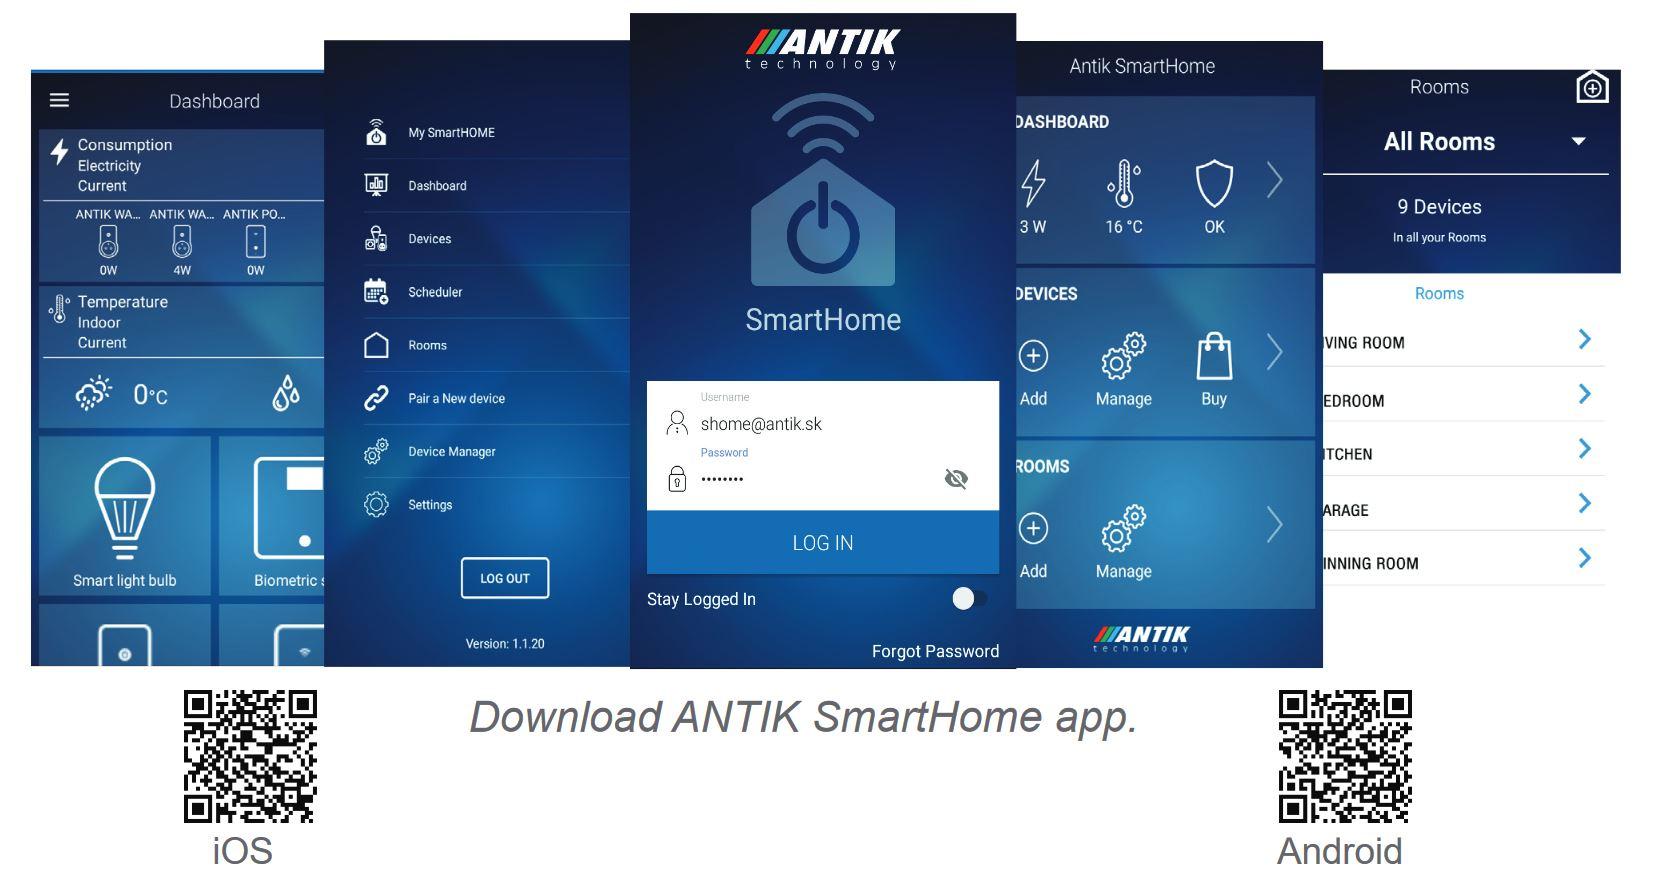 ANTIK Technology